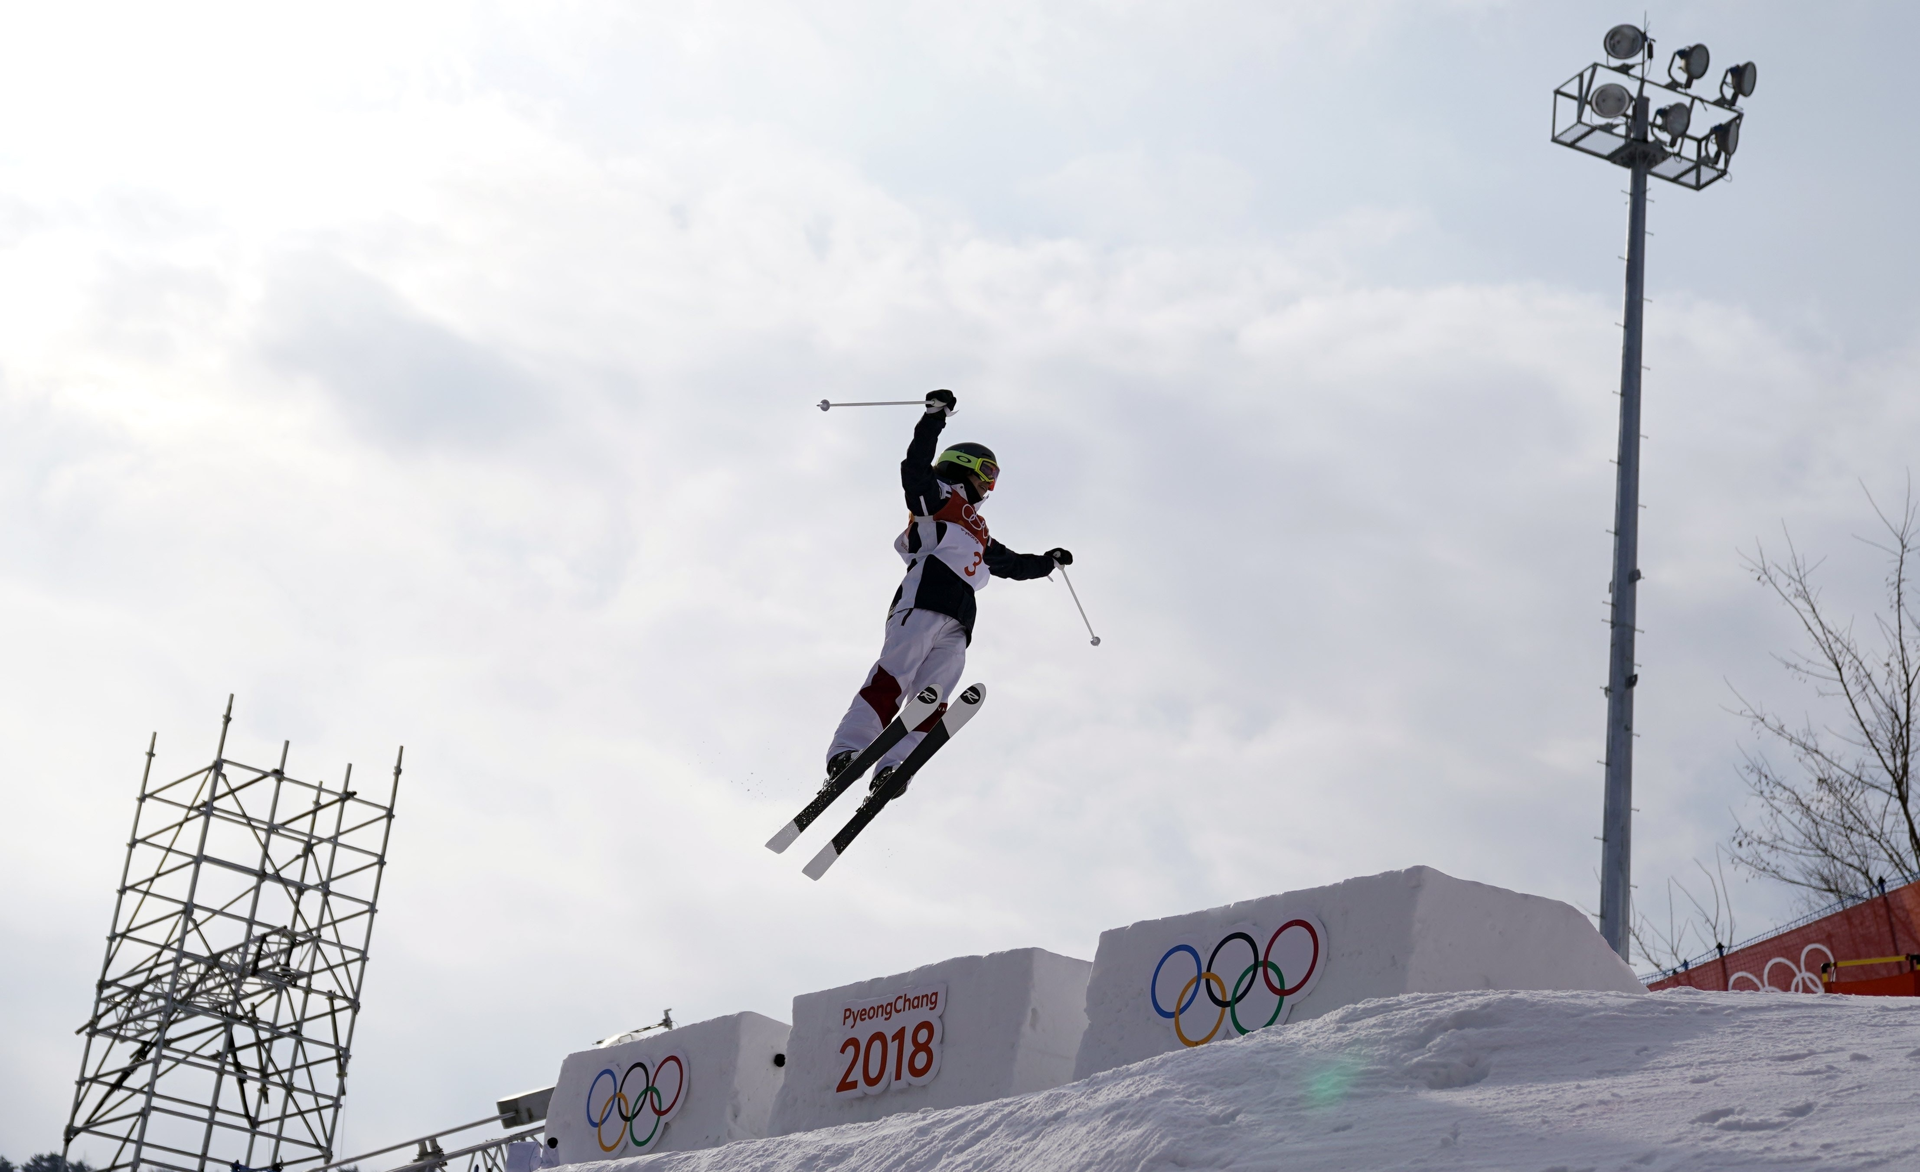 What makes a winning mogul skier like Matt Graham?